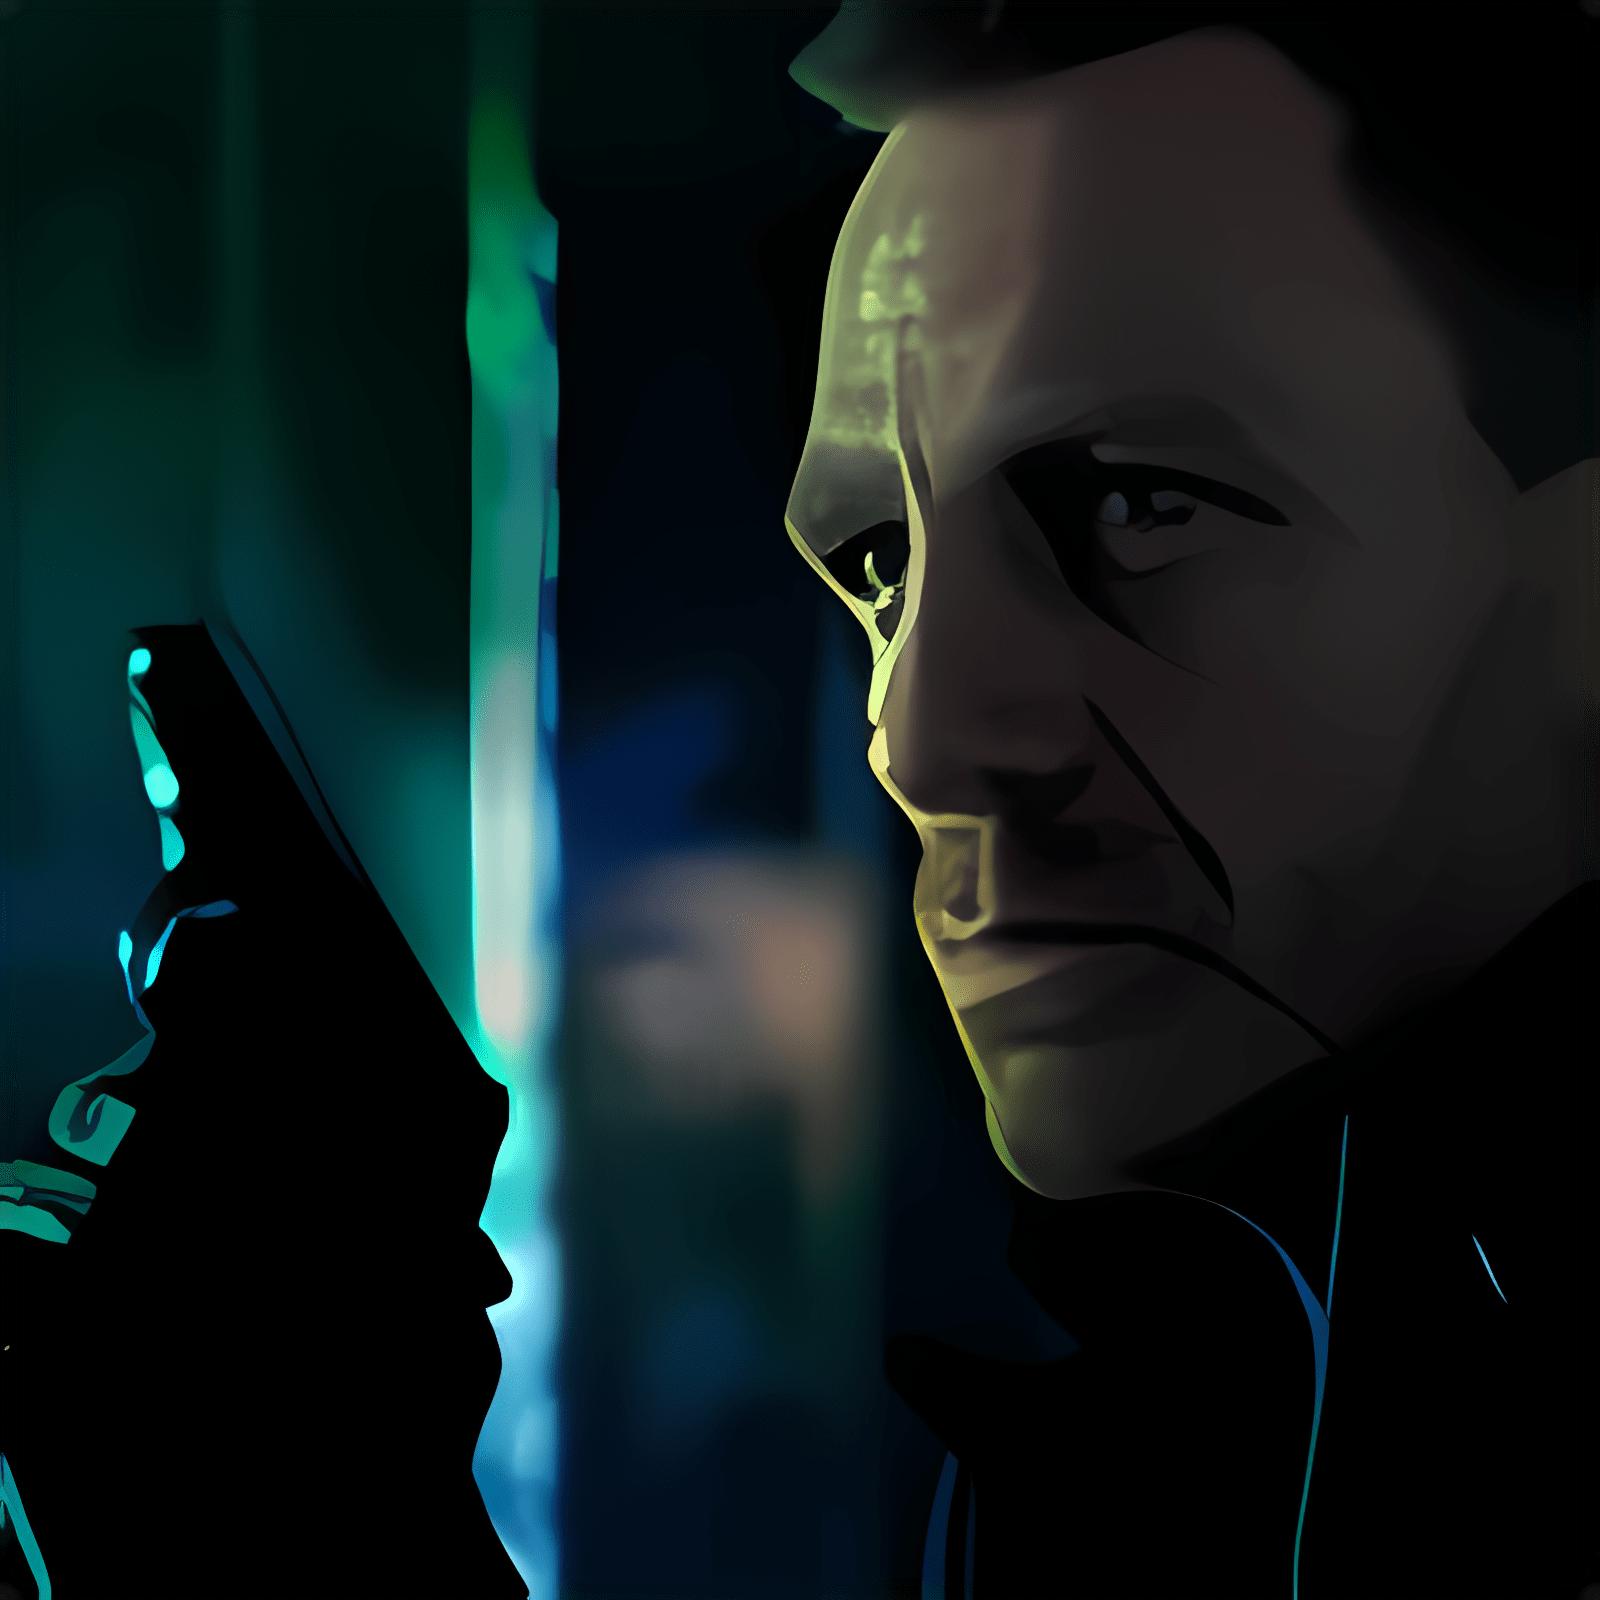 James Bond Skyfall Wallpaper